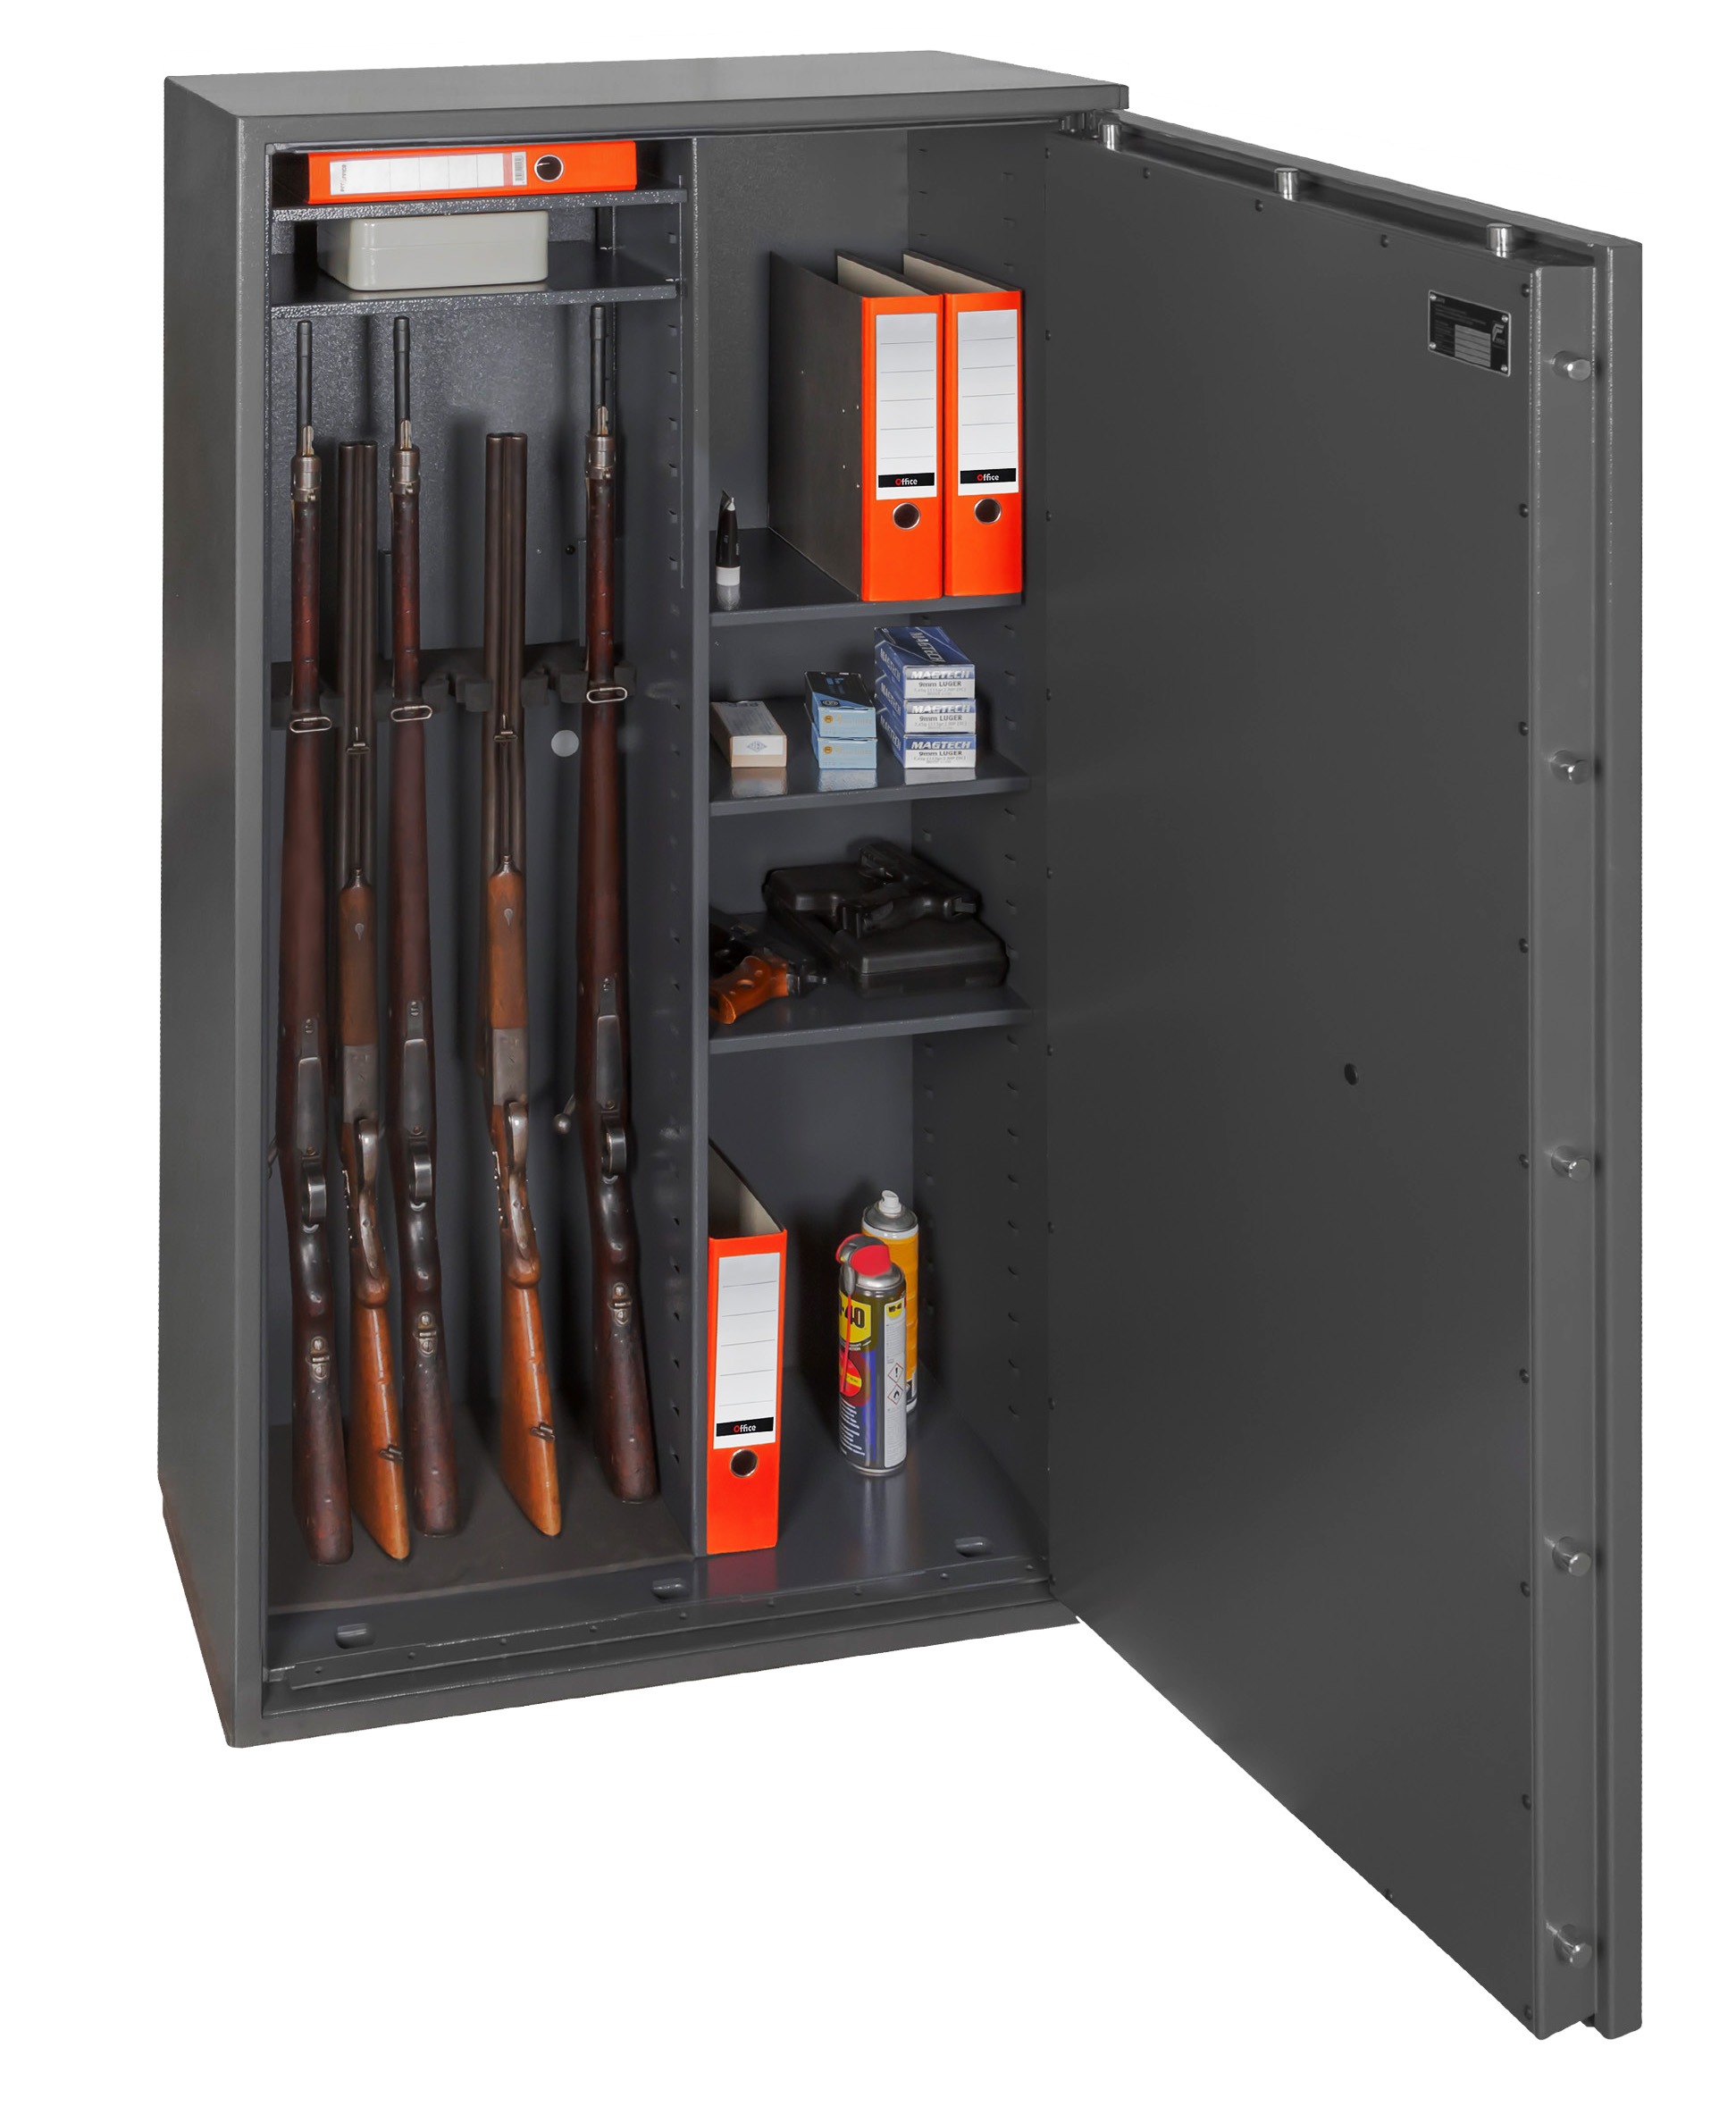 waffenschrank grad 0 en 1143 1 gun safe 1 8 kombi mit zahlenschloss. Black Bedroom Furniture Sets. Home Design Ideas